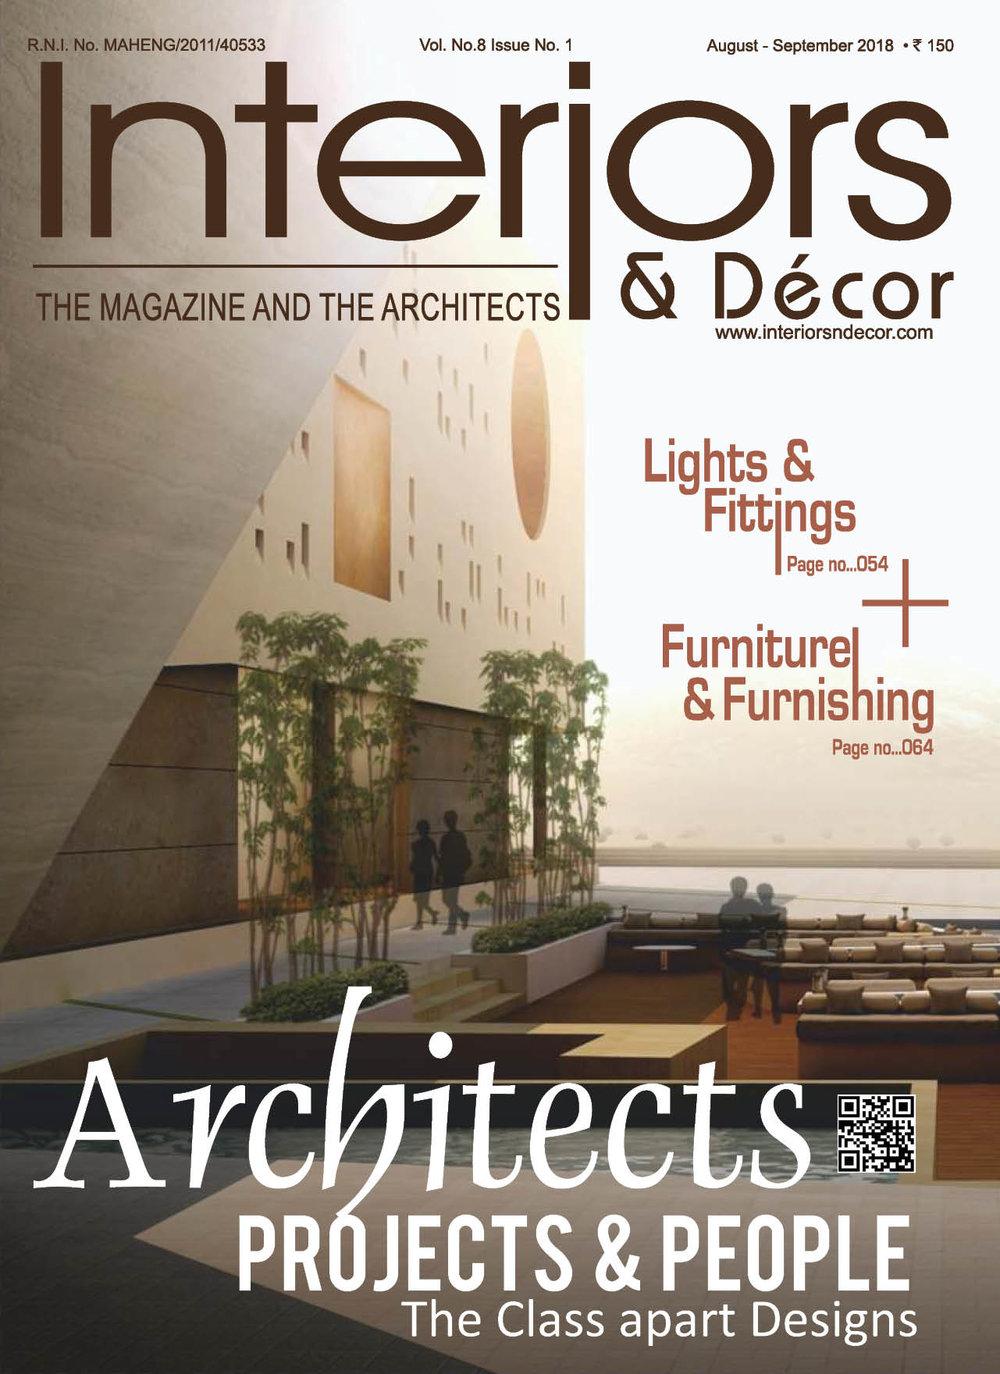 Interiors & Decor, Aug 2018